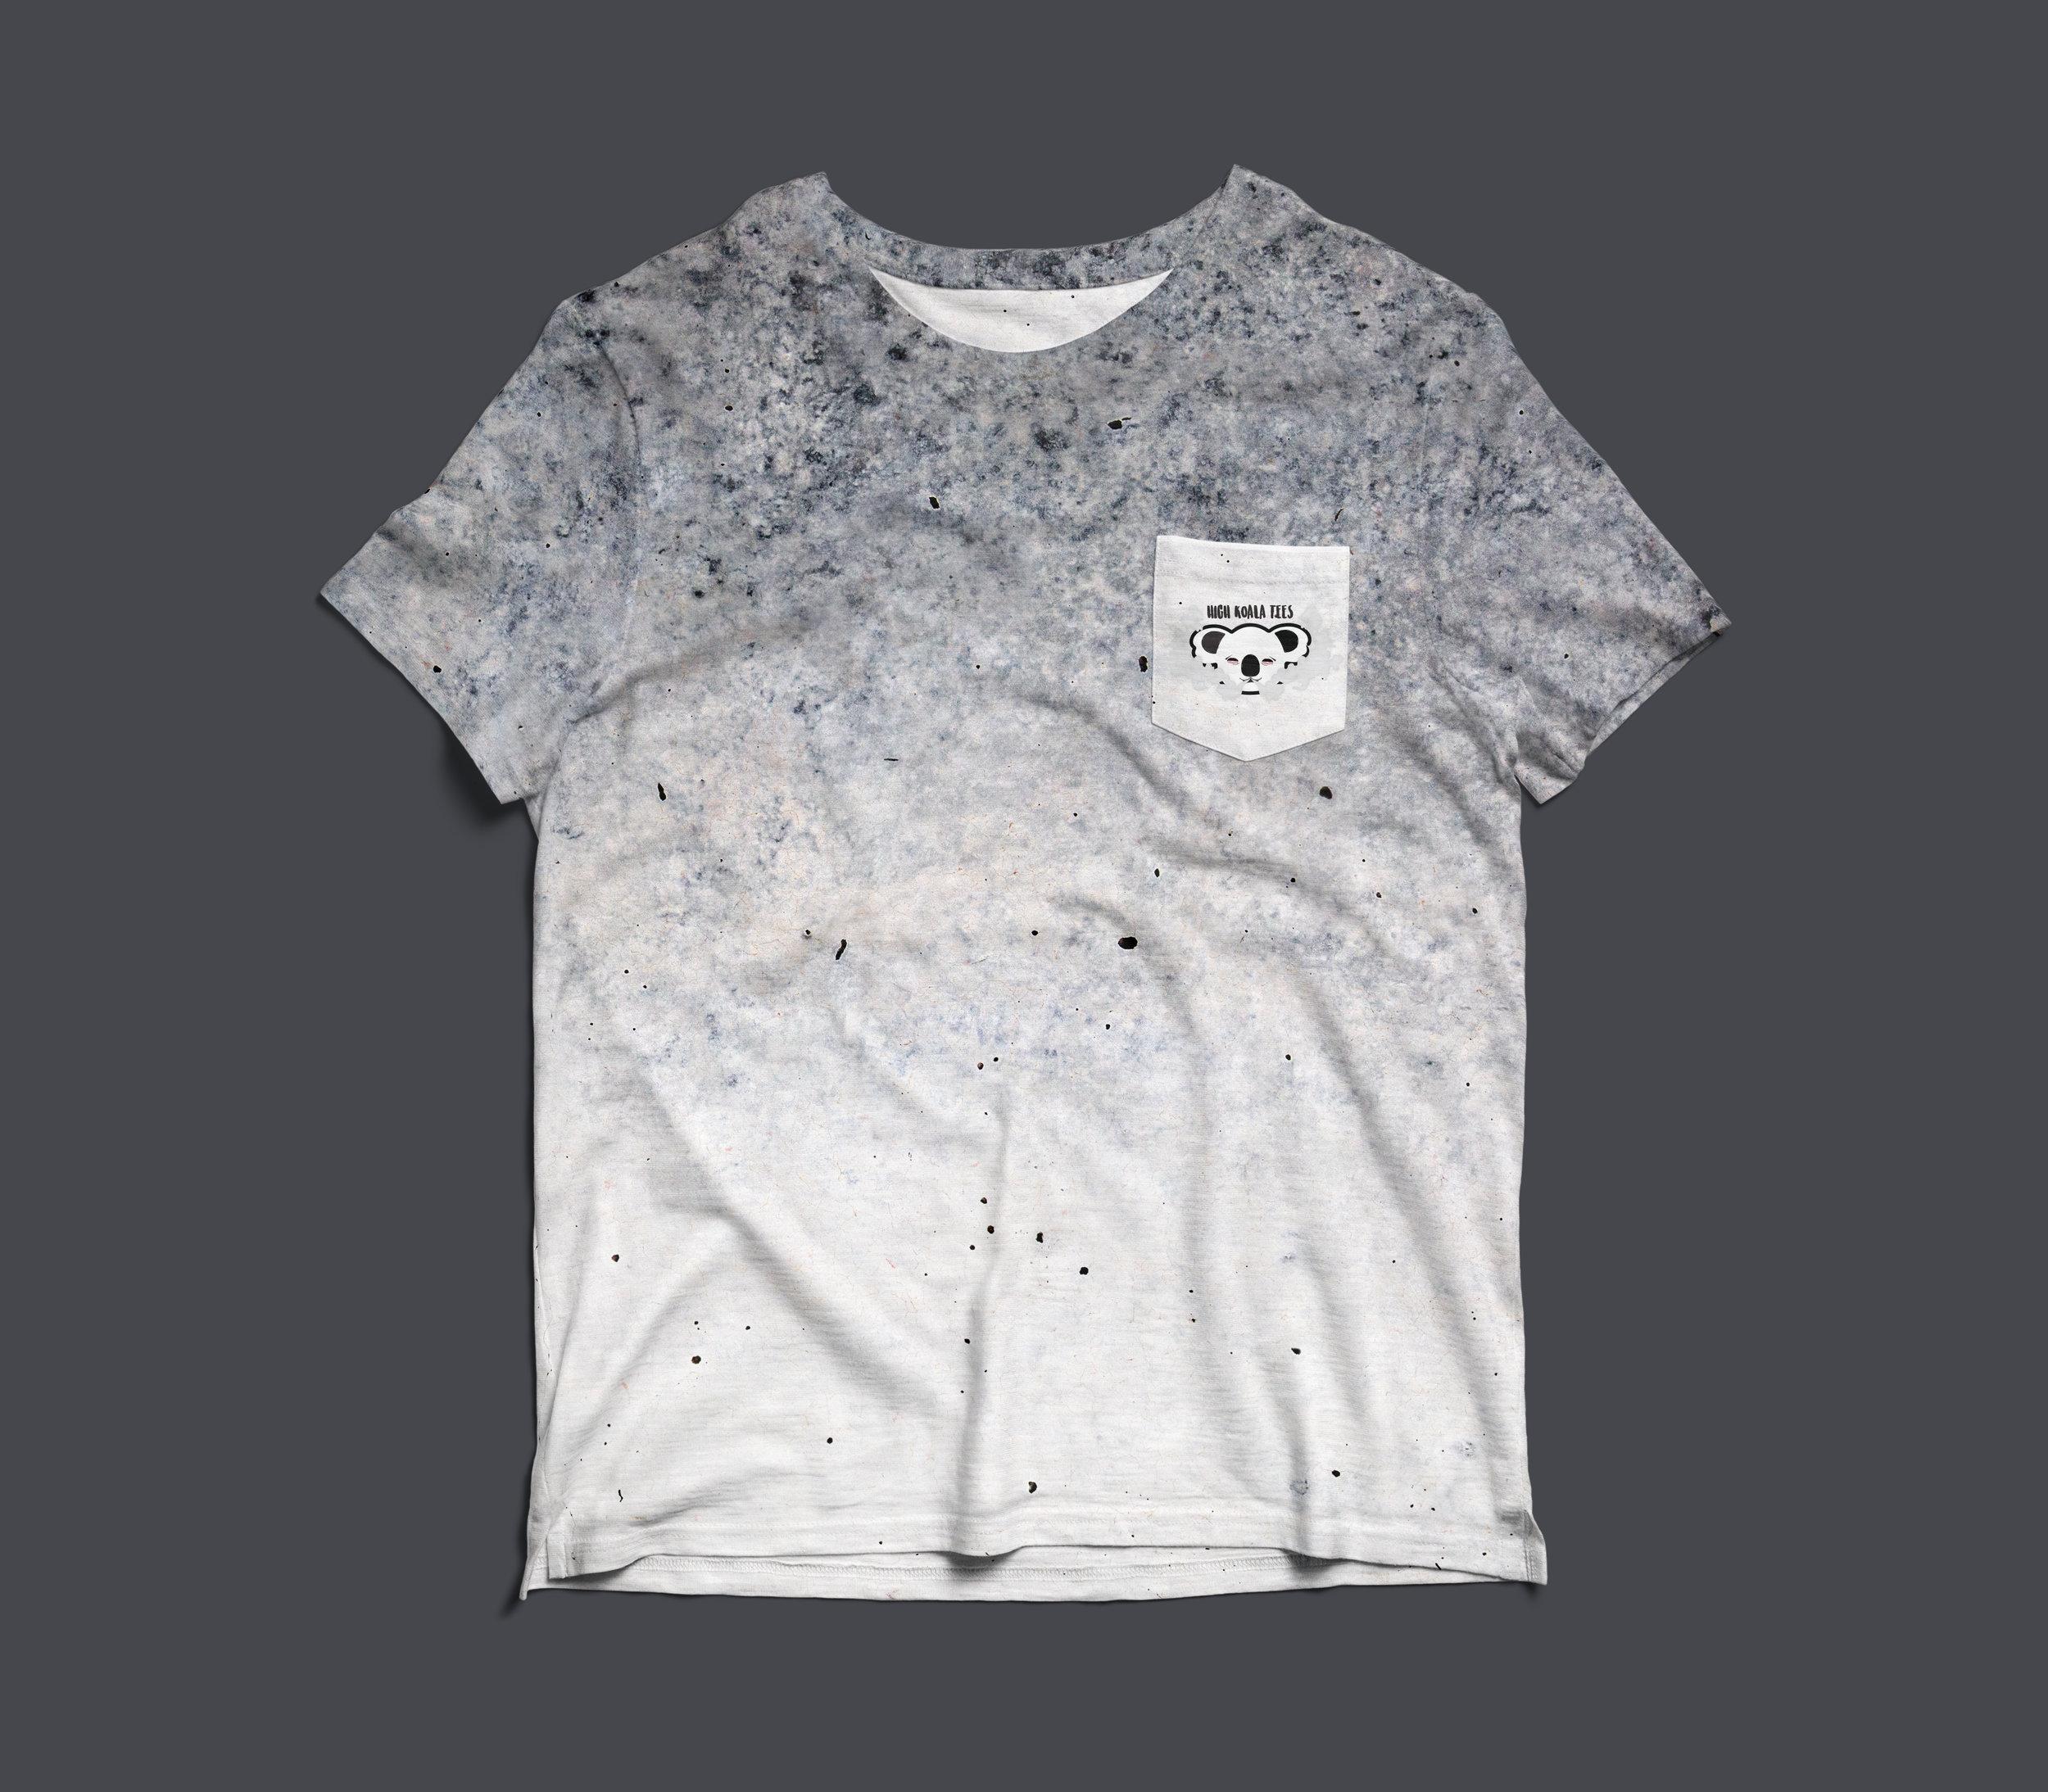 T-shirt 2.jpg